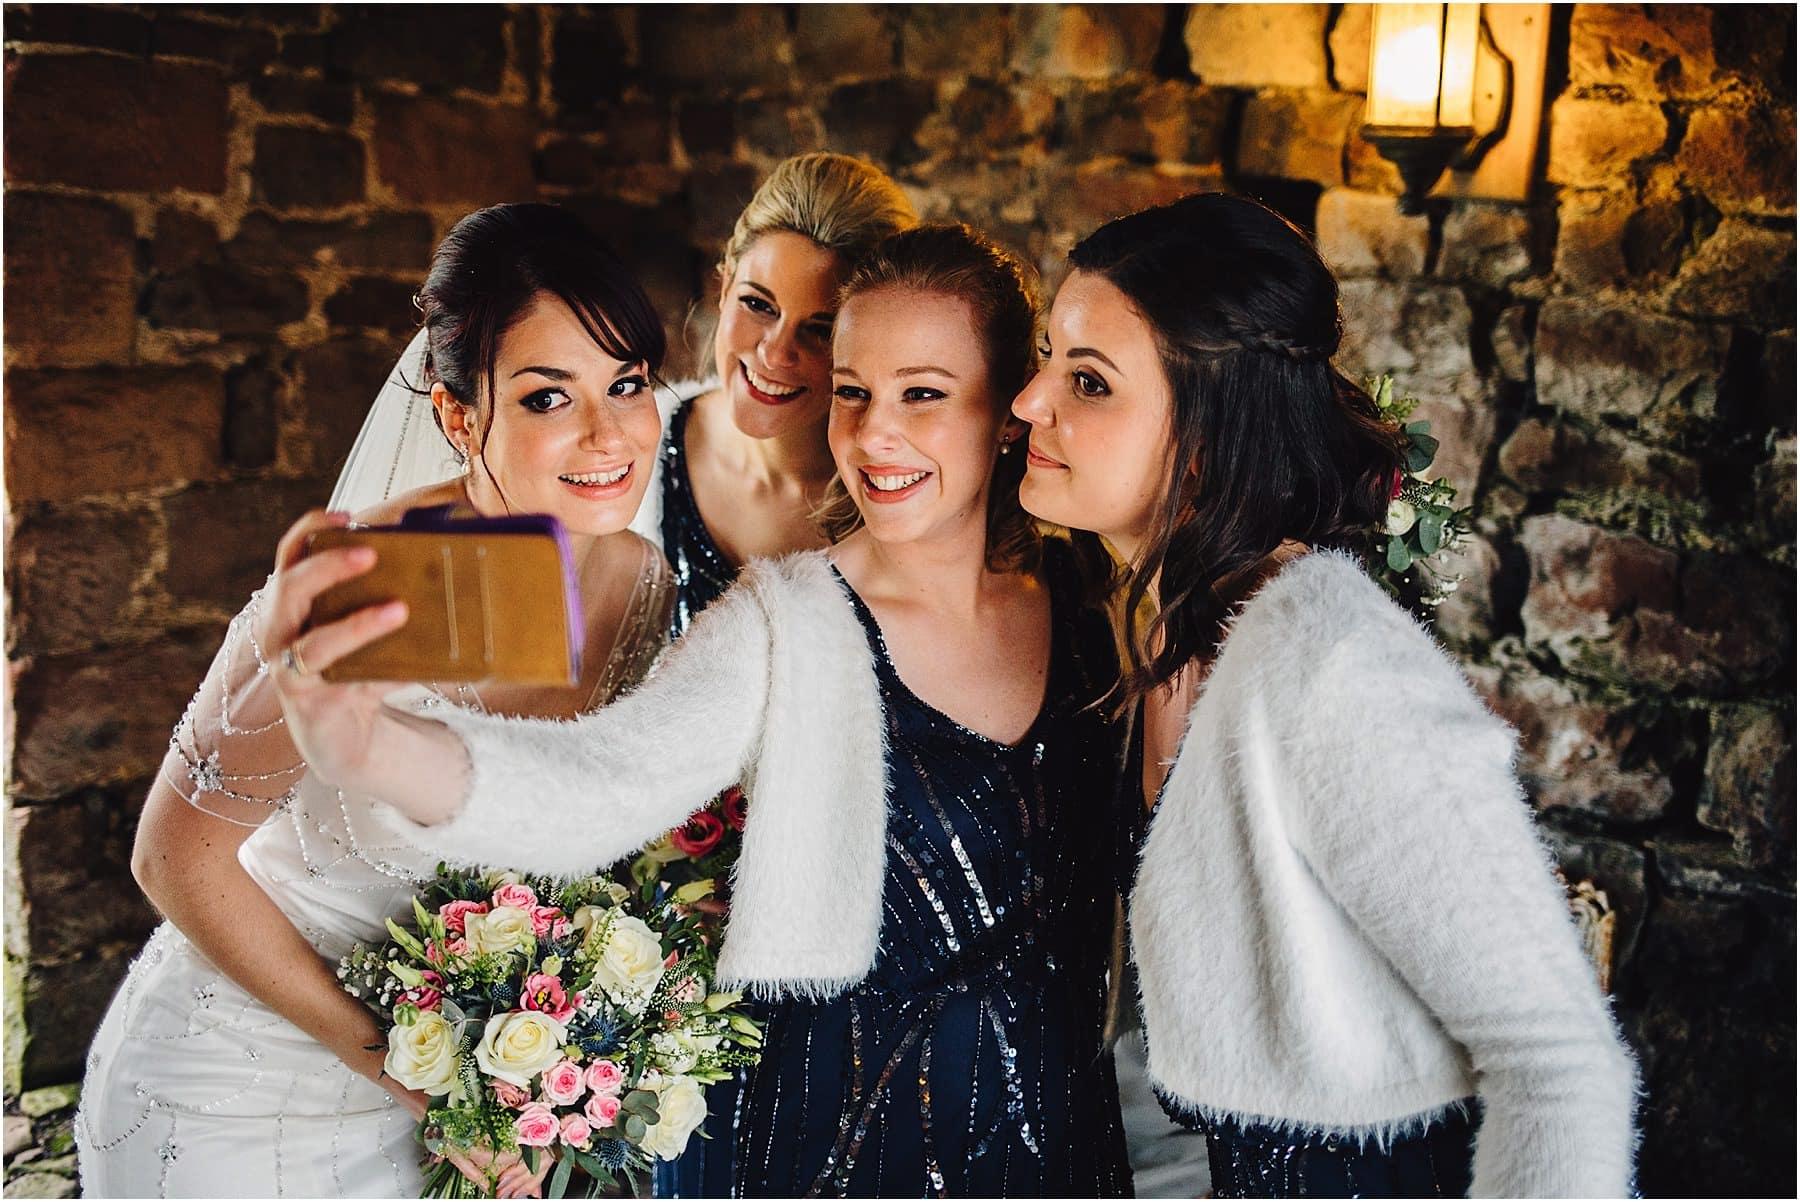 Bride & Bridesmaids taking a selfie